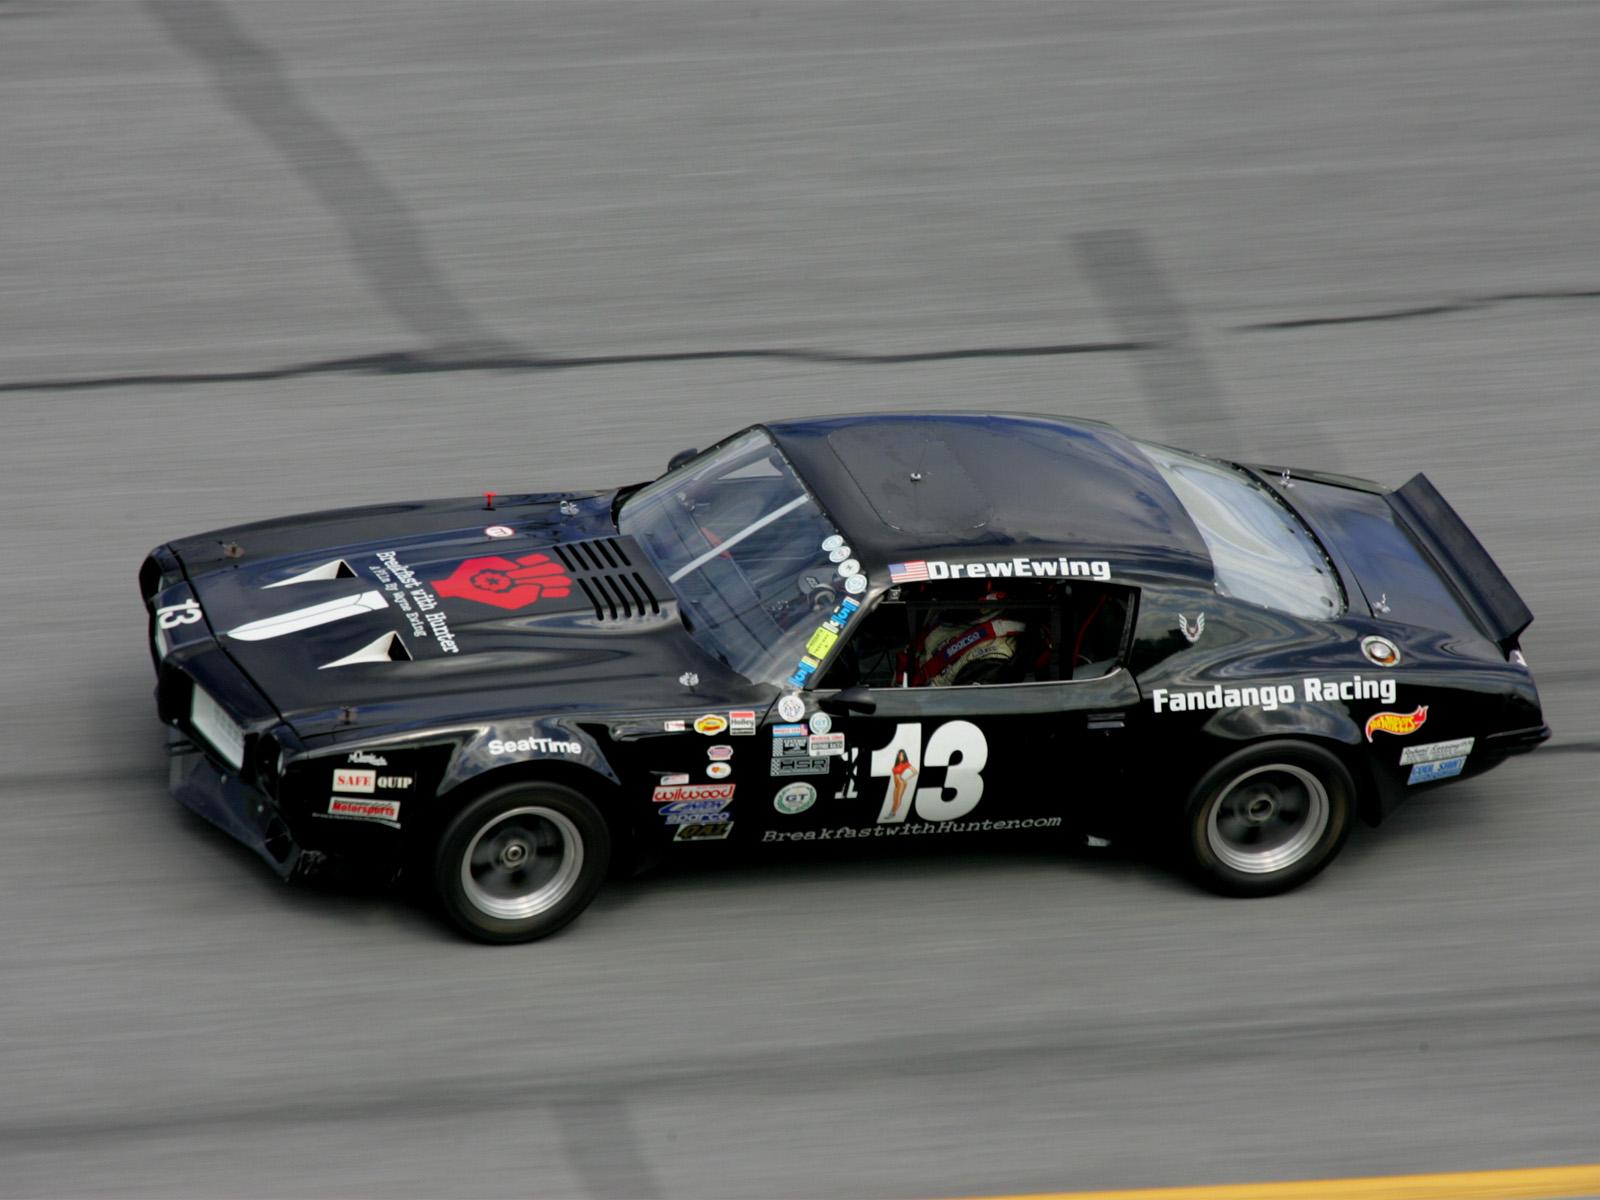 Black Race Car